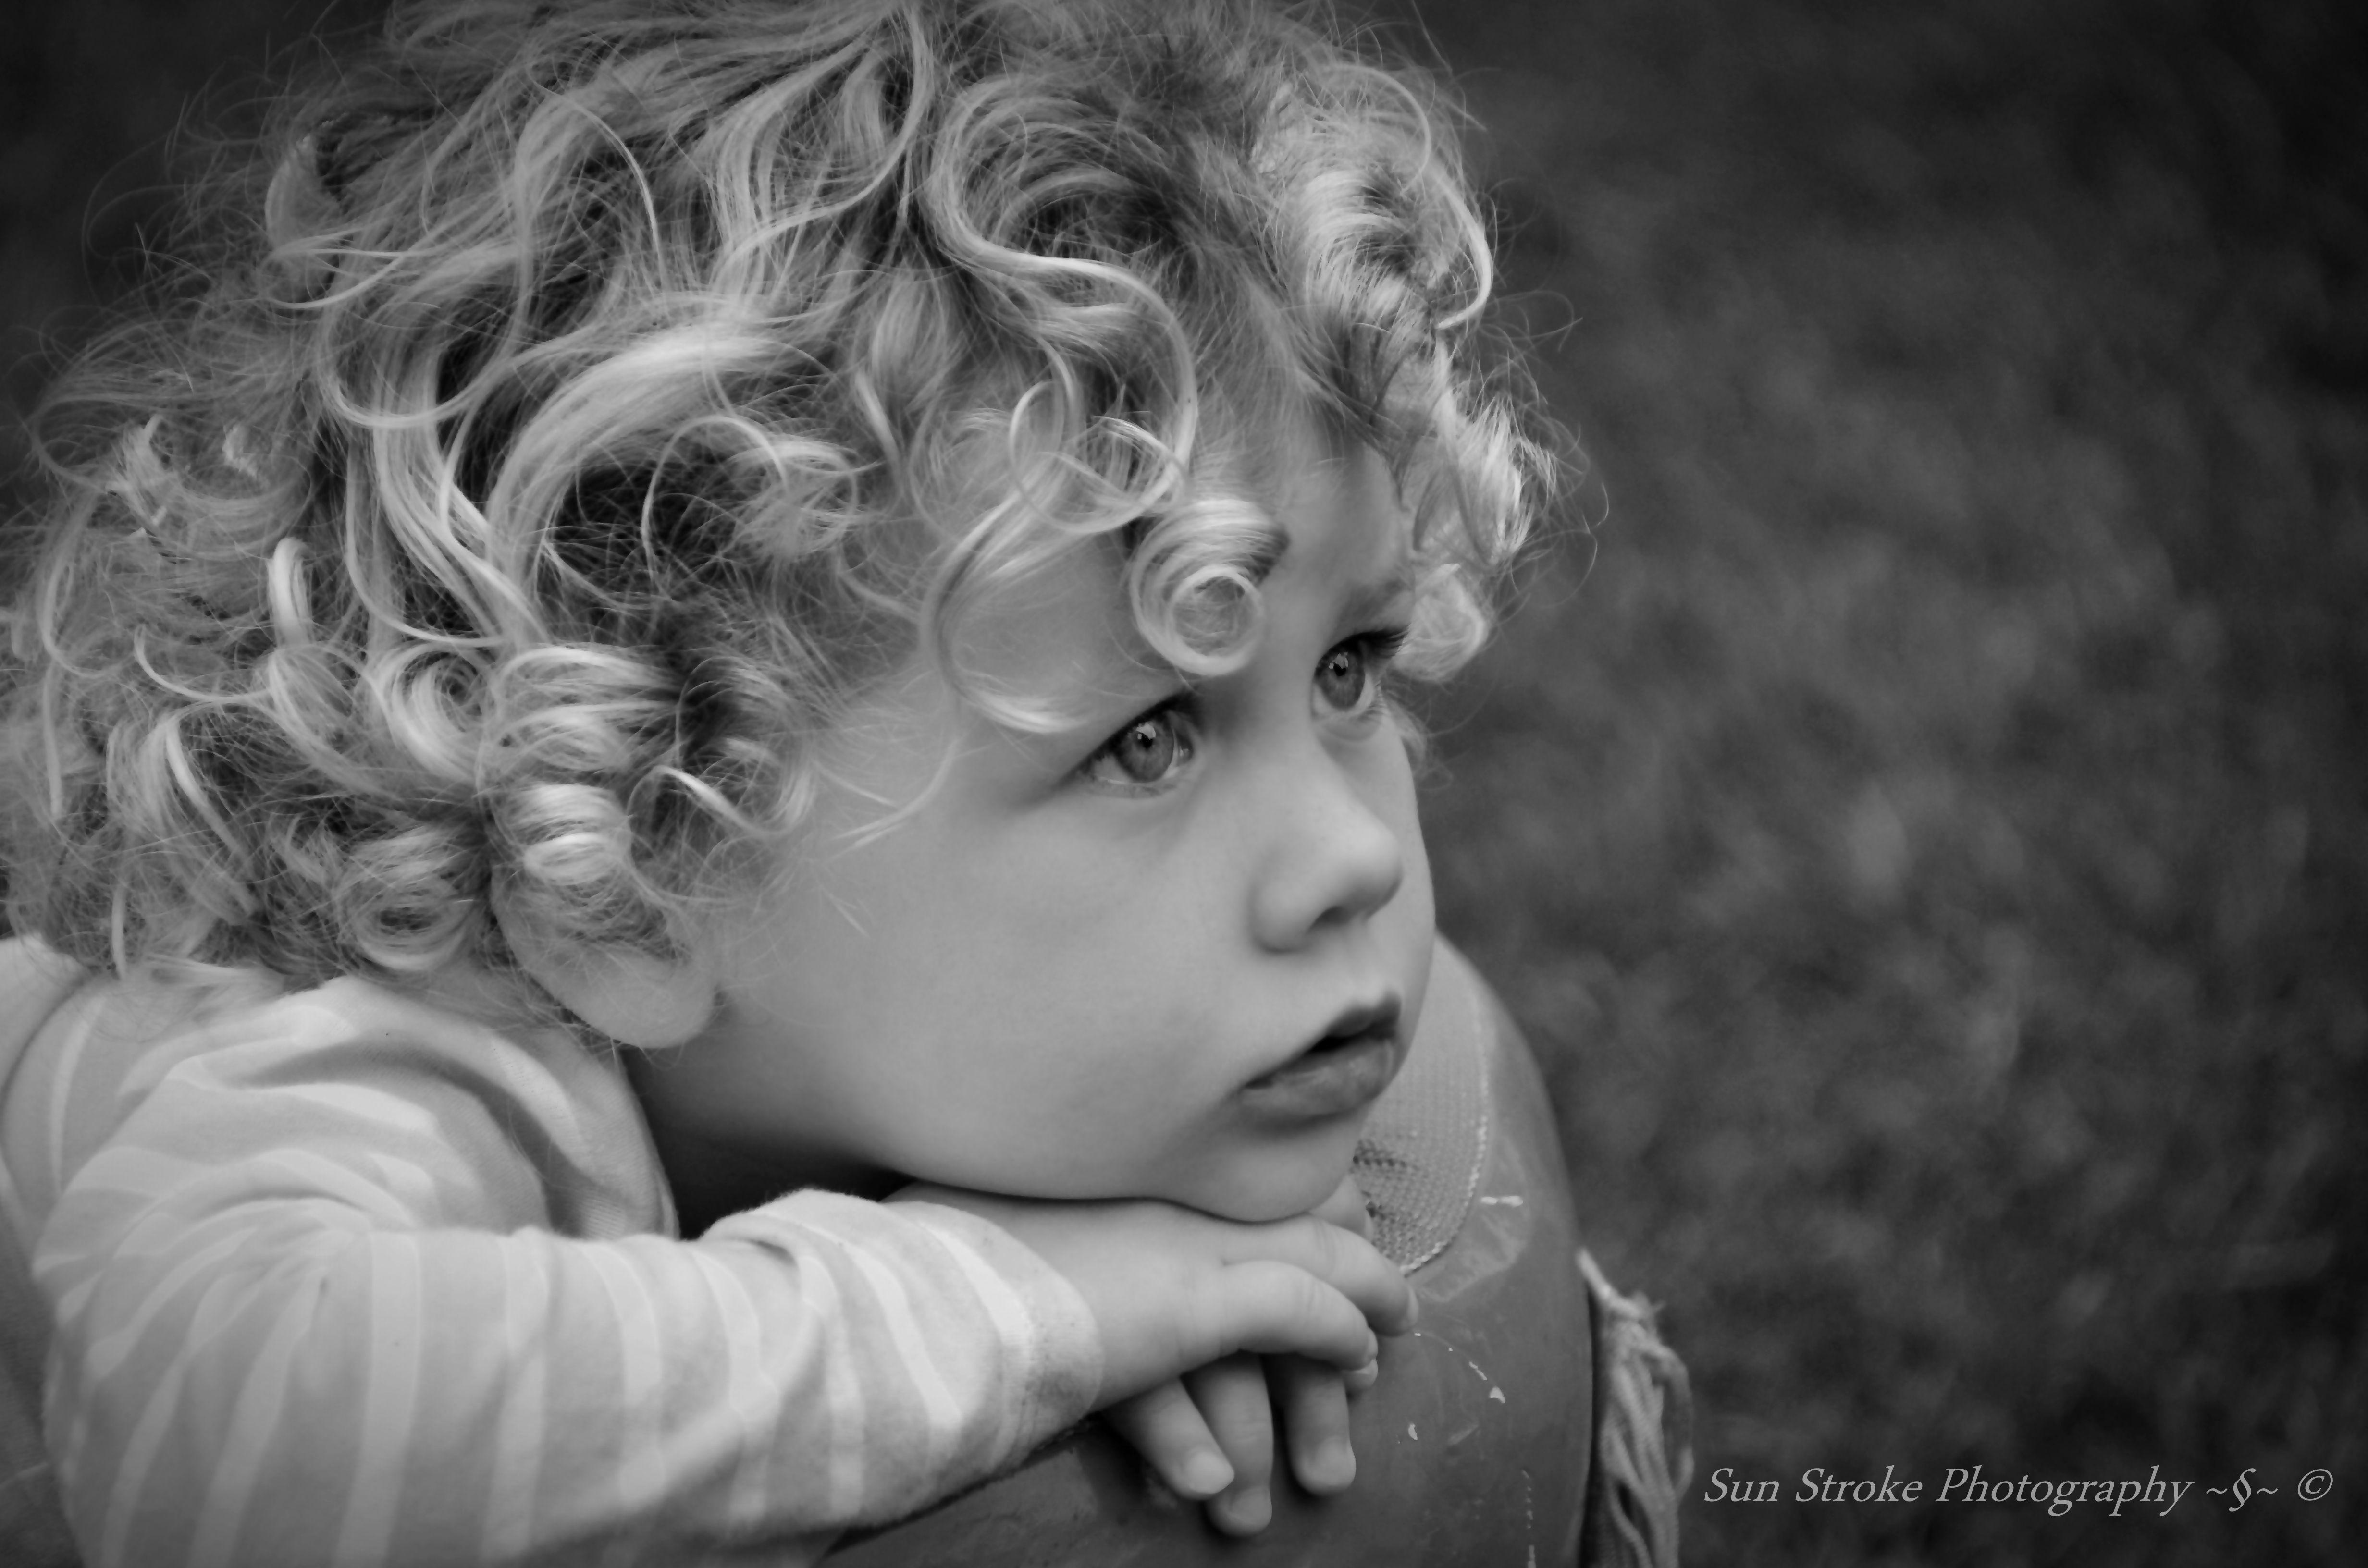 Sun Stroke Photography